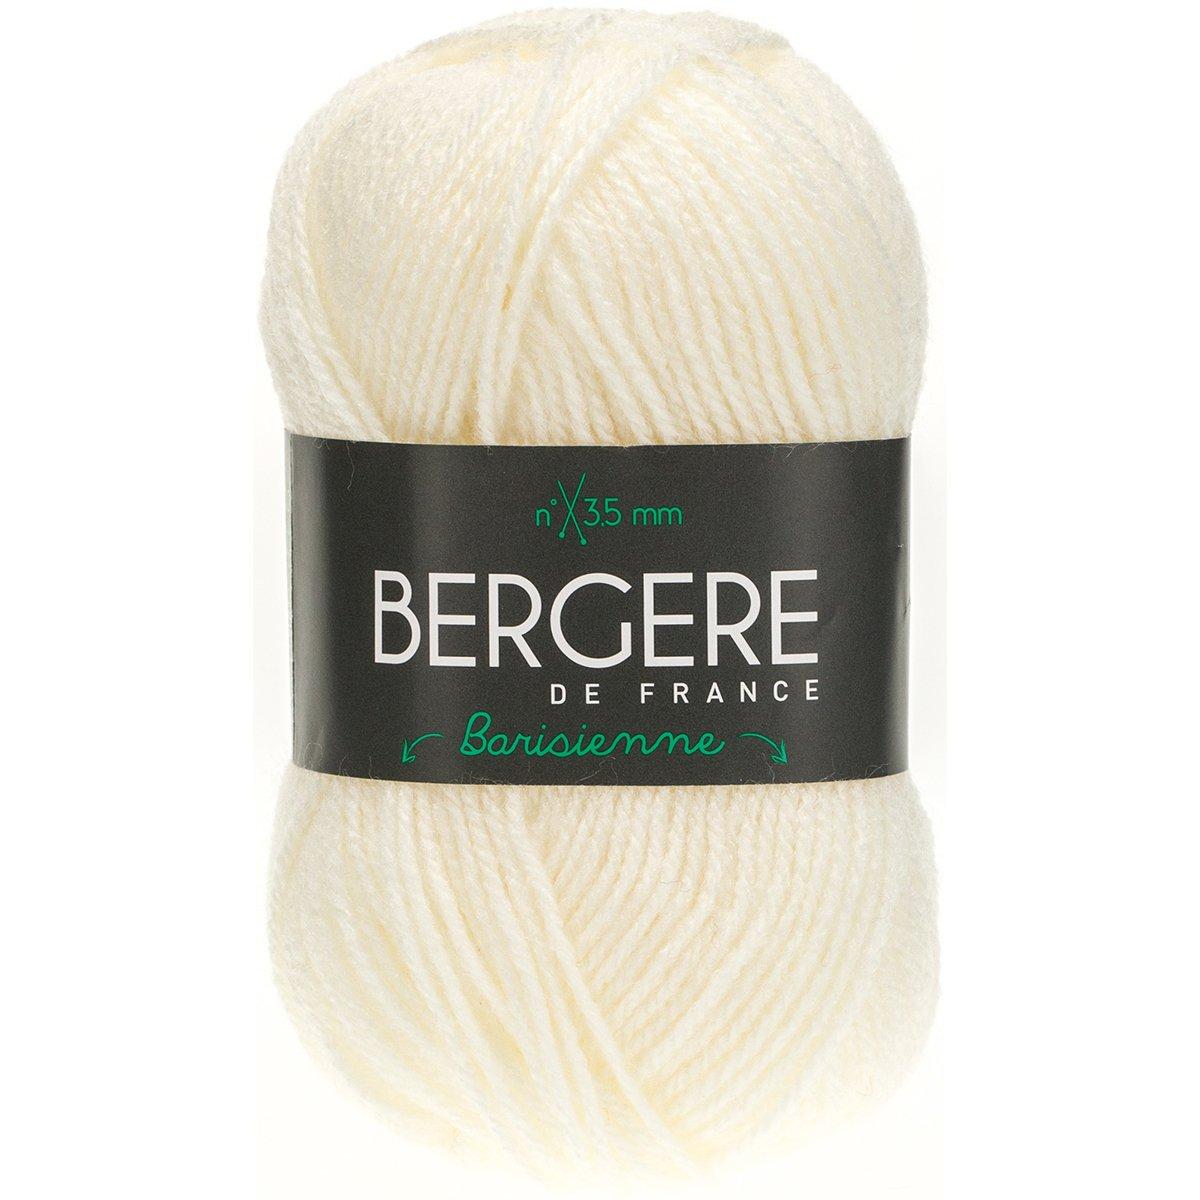 Bergere de France Barisienne Yarn, Multi-Colour, 7.62 x 15.24 x 7.62 cm